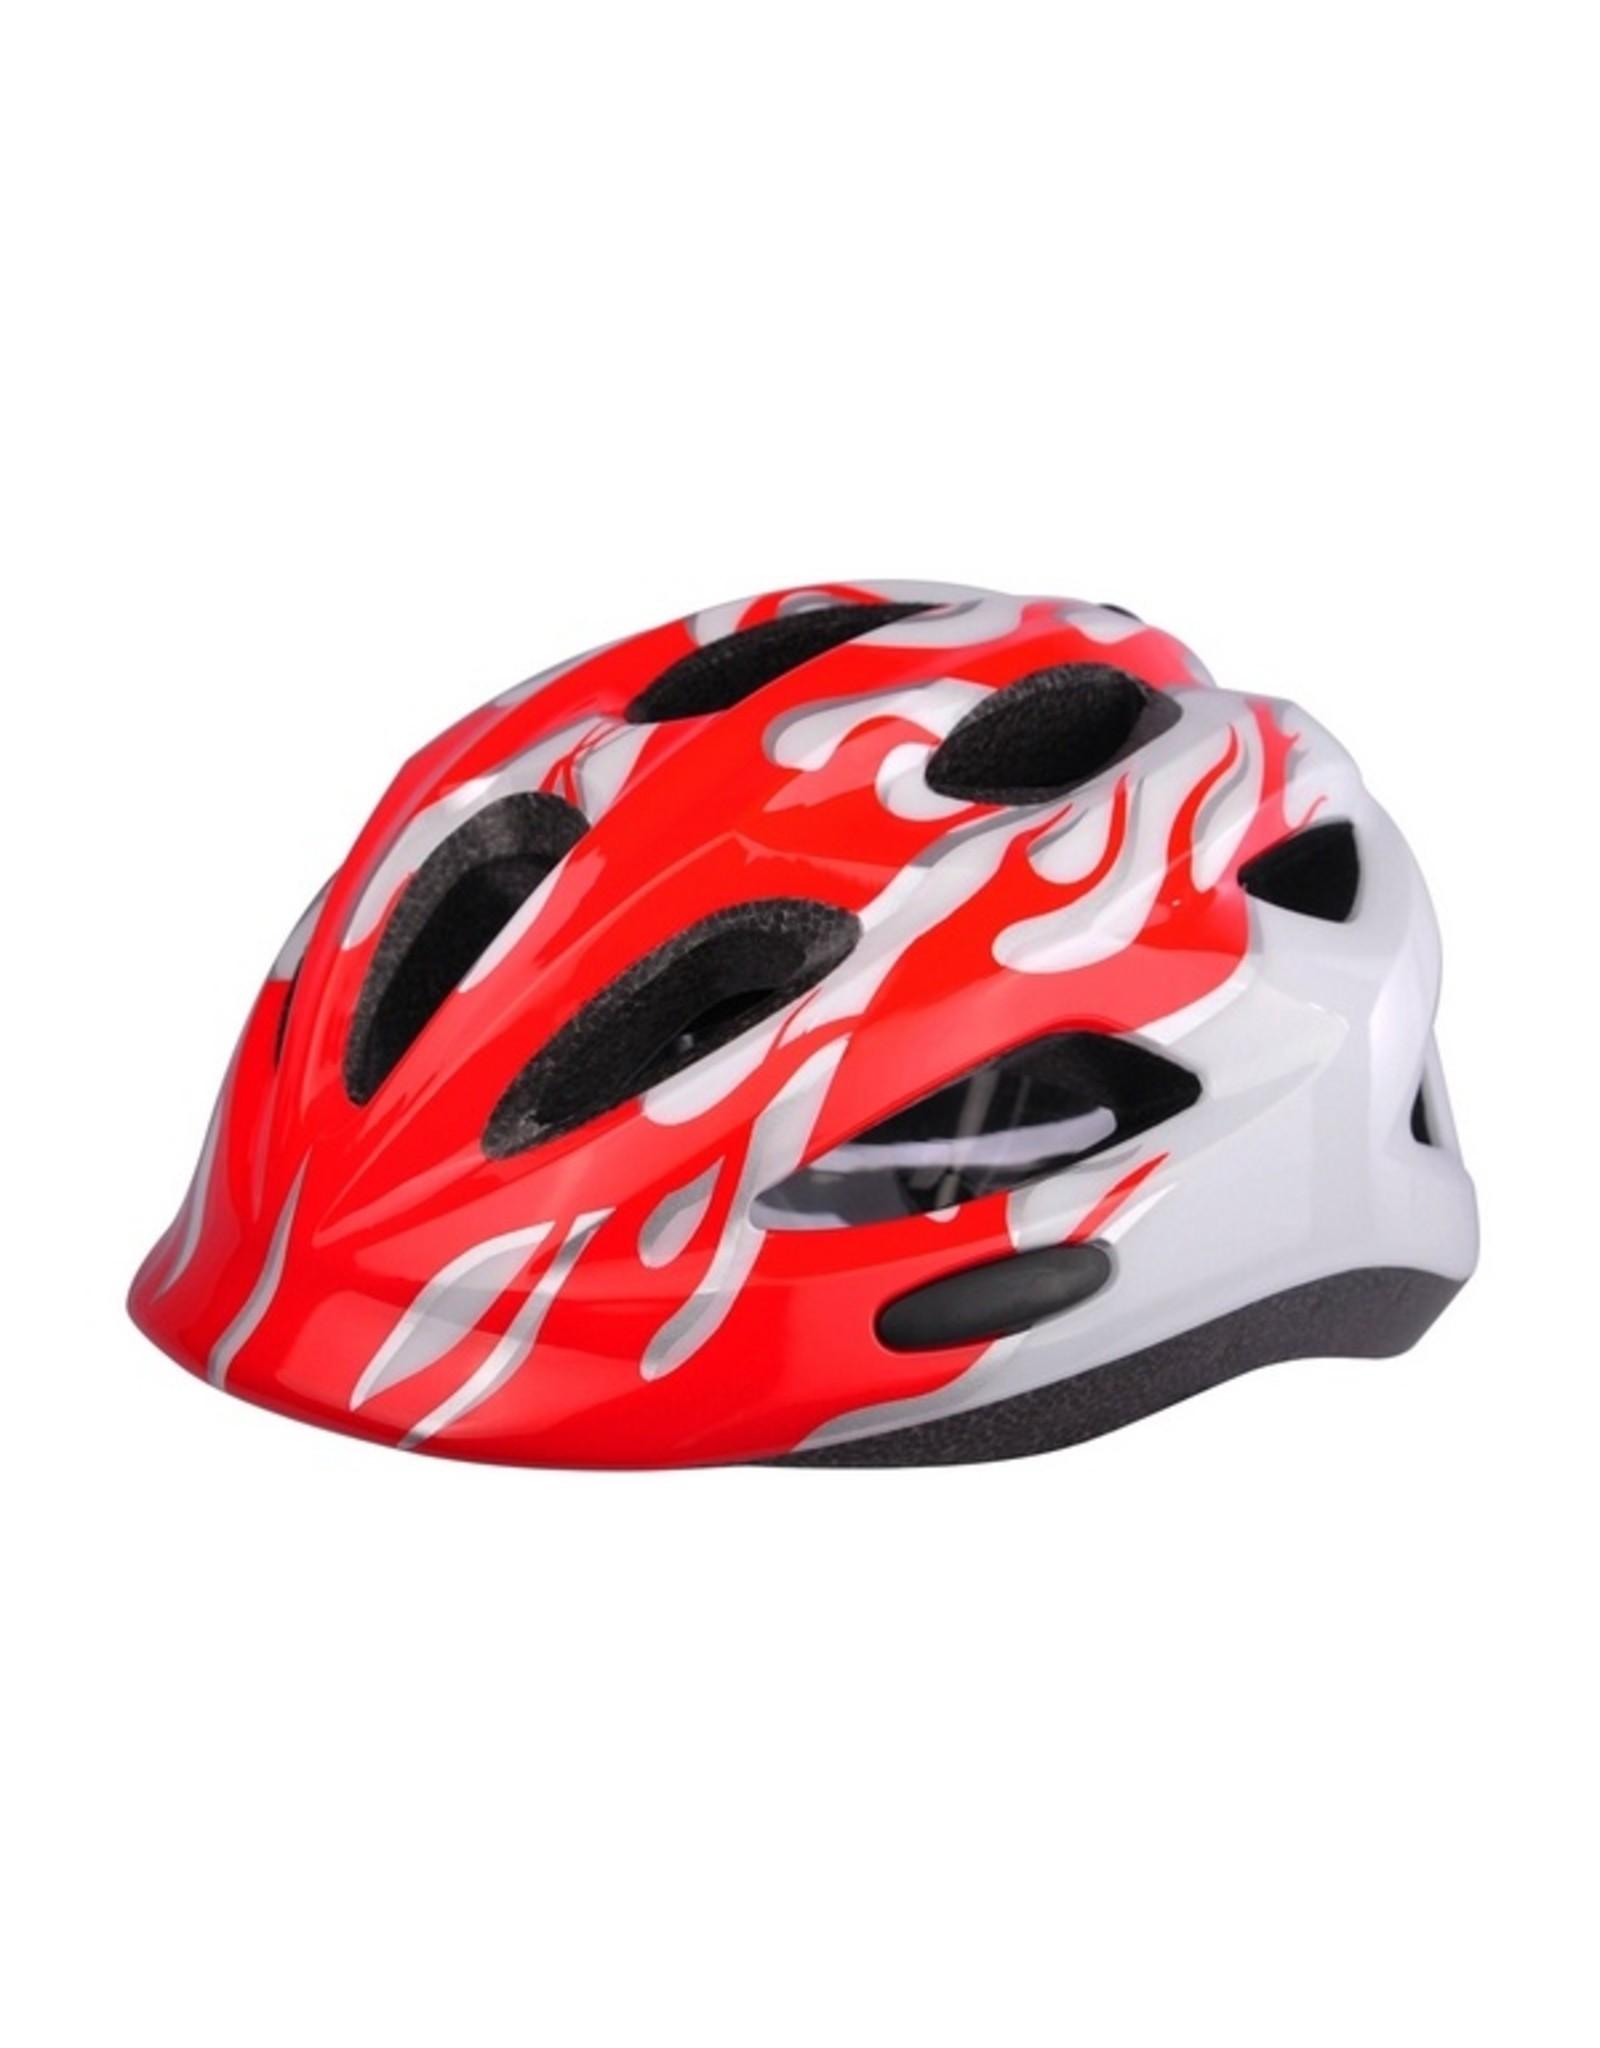 QT fietshelm kleuter Red Flames